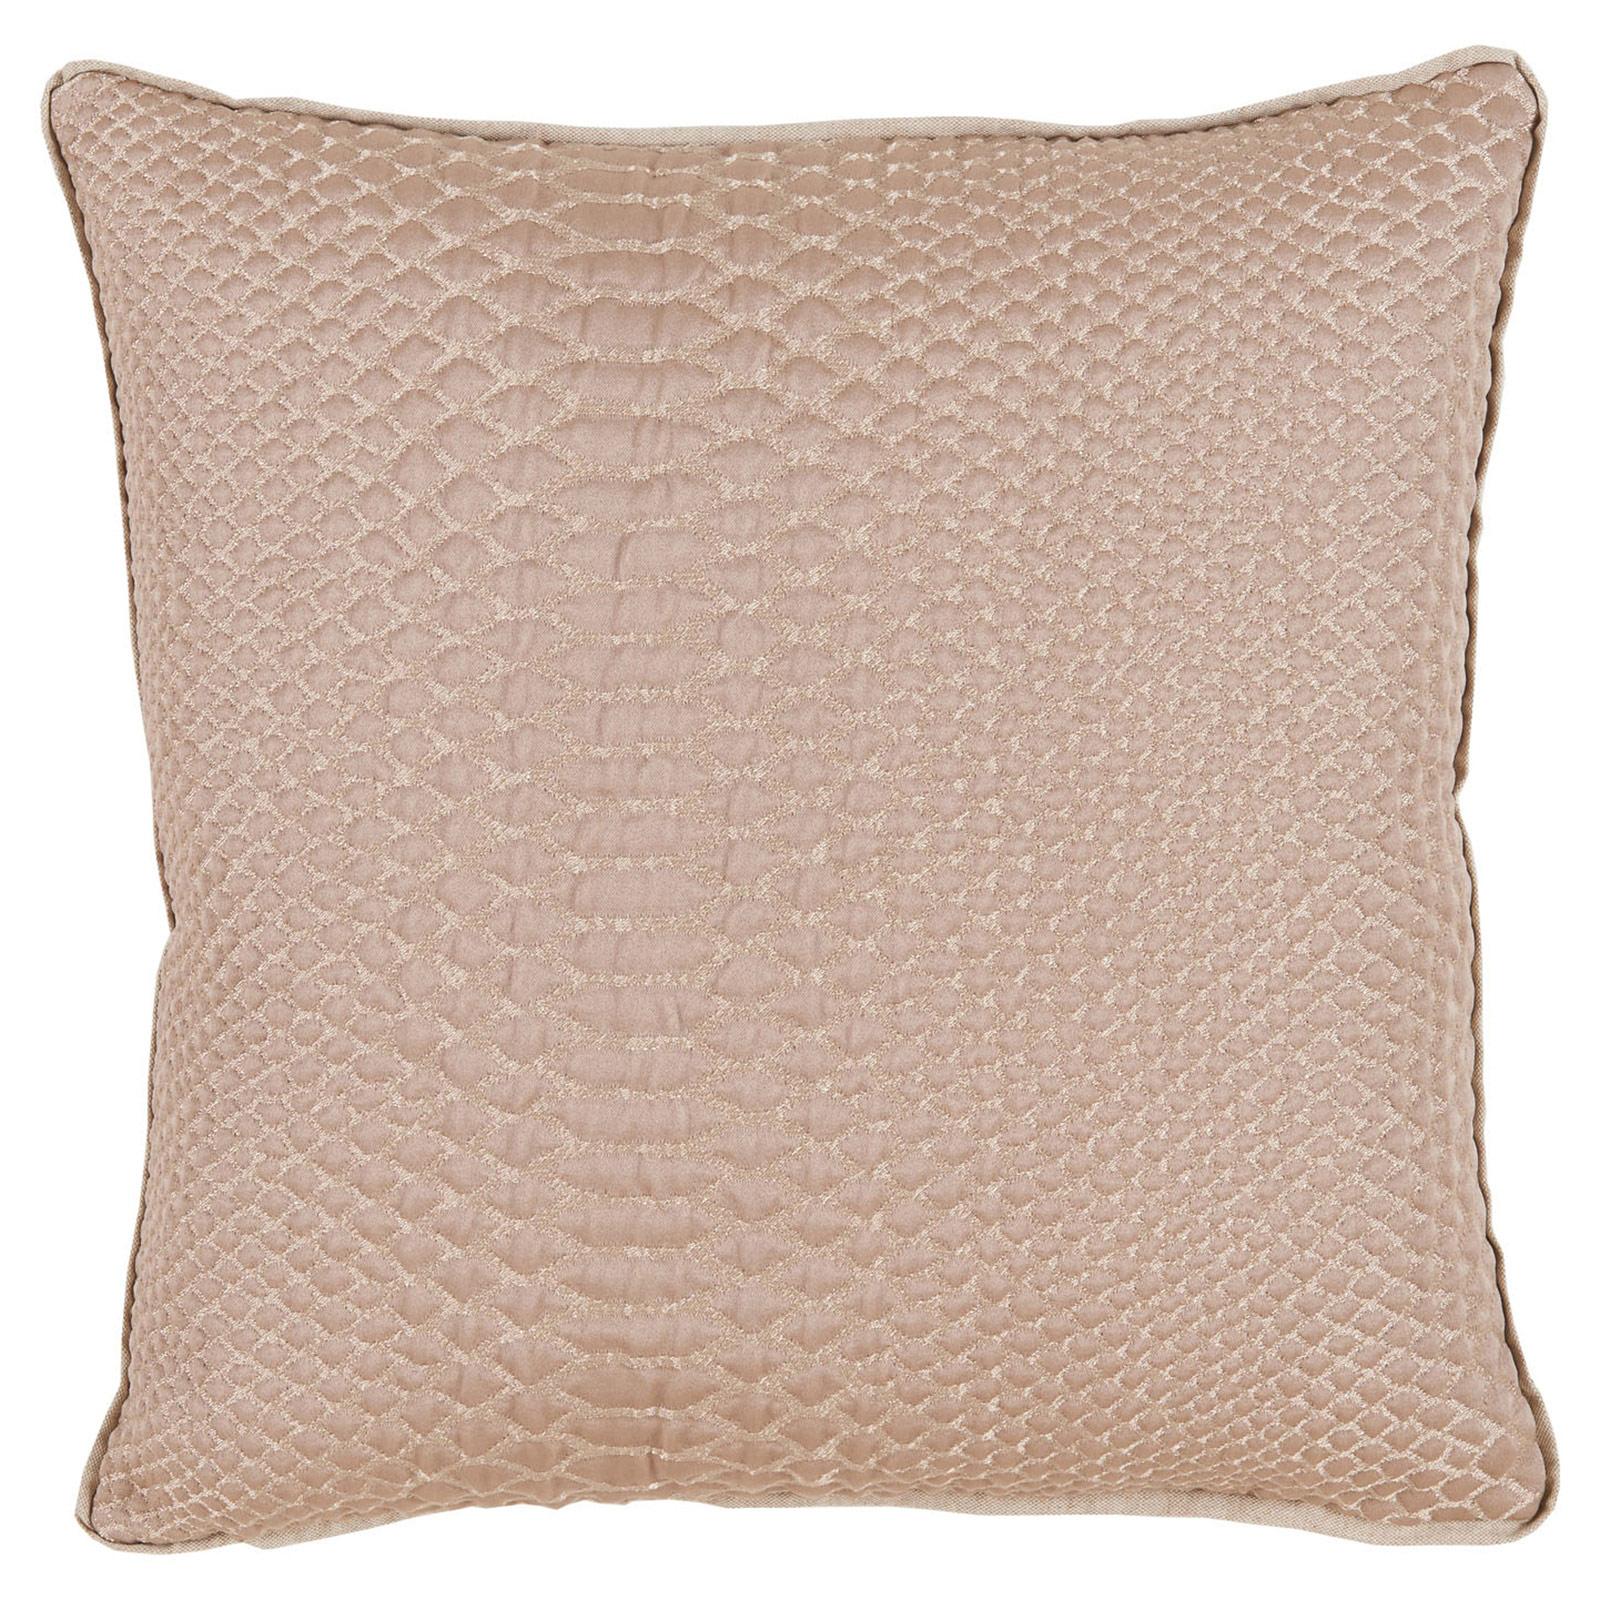 Shesha Hollywood Regency Brass Alligator Pillow - 20x20